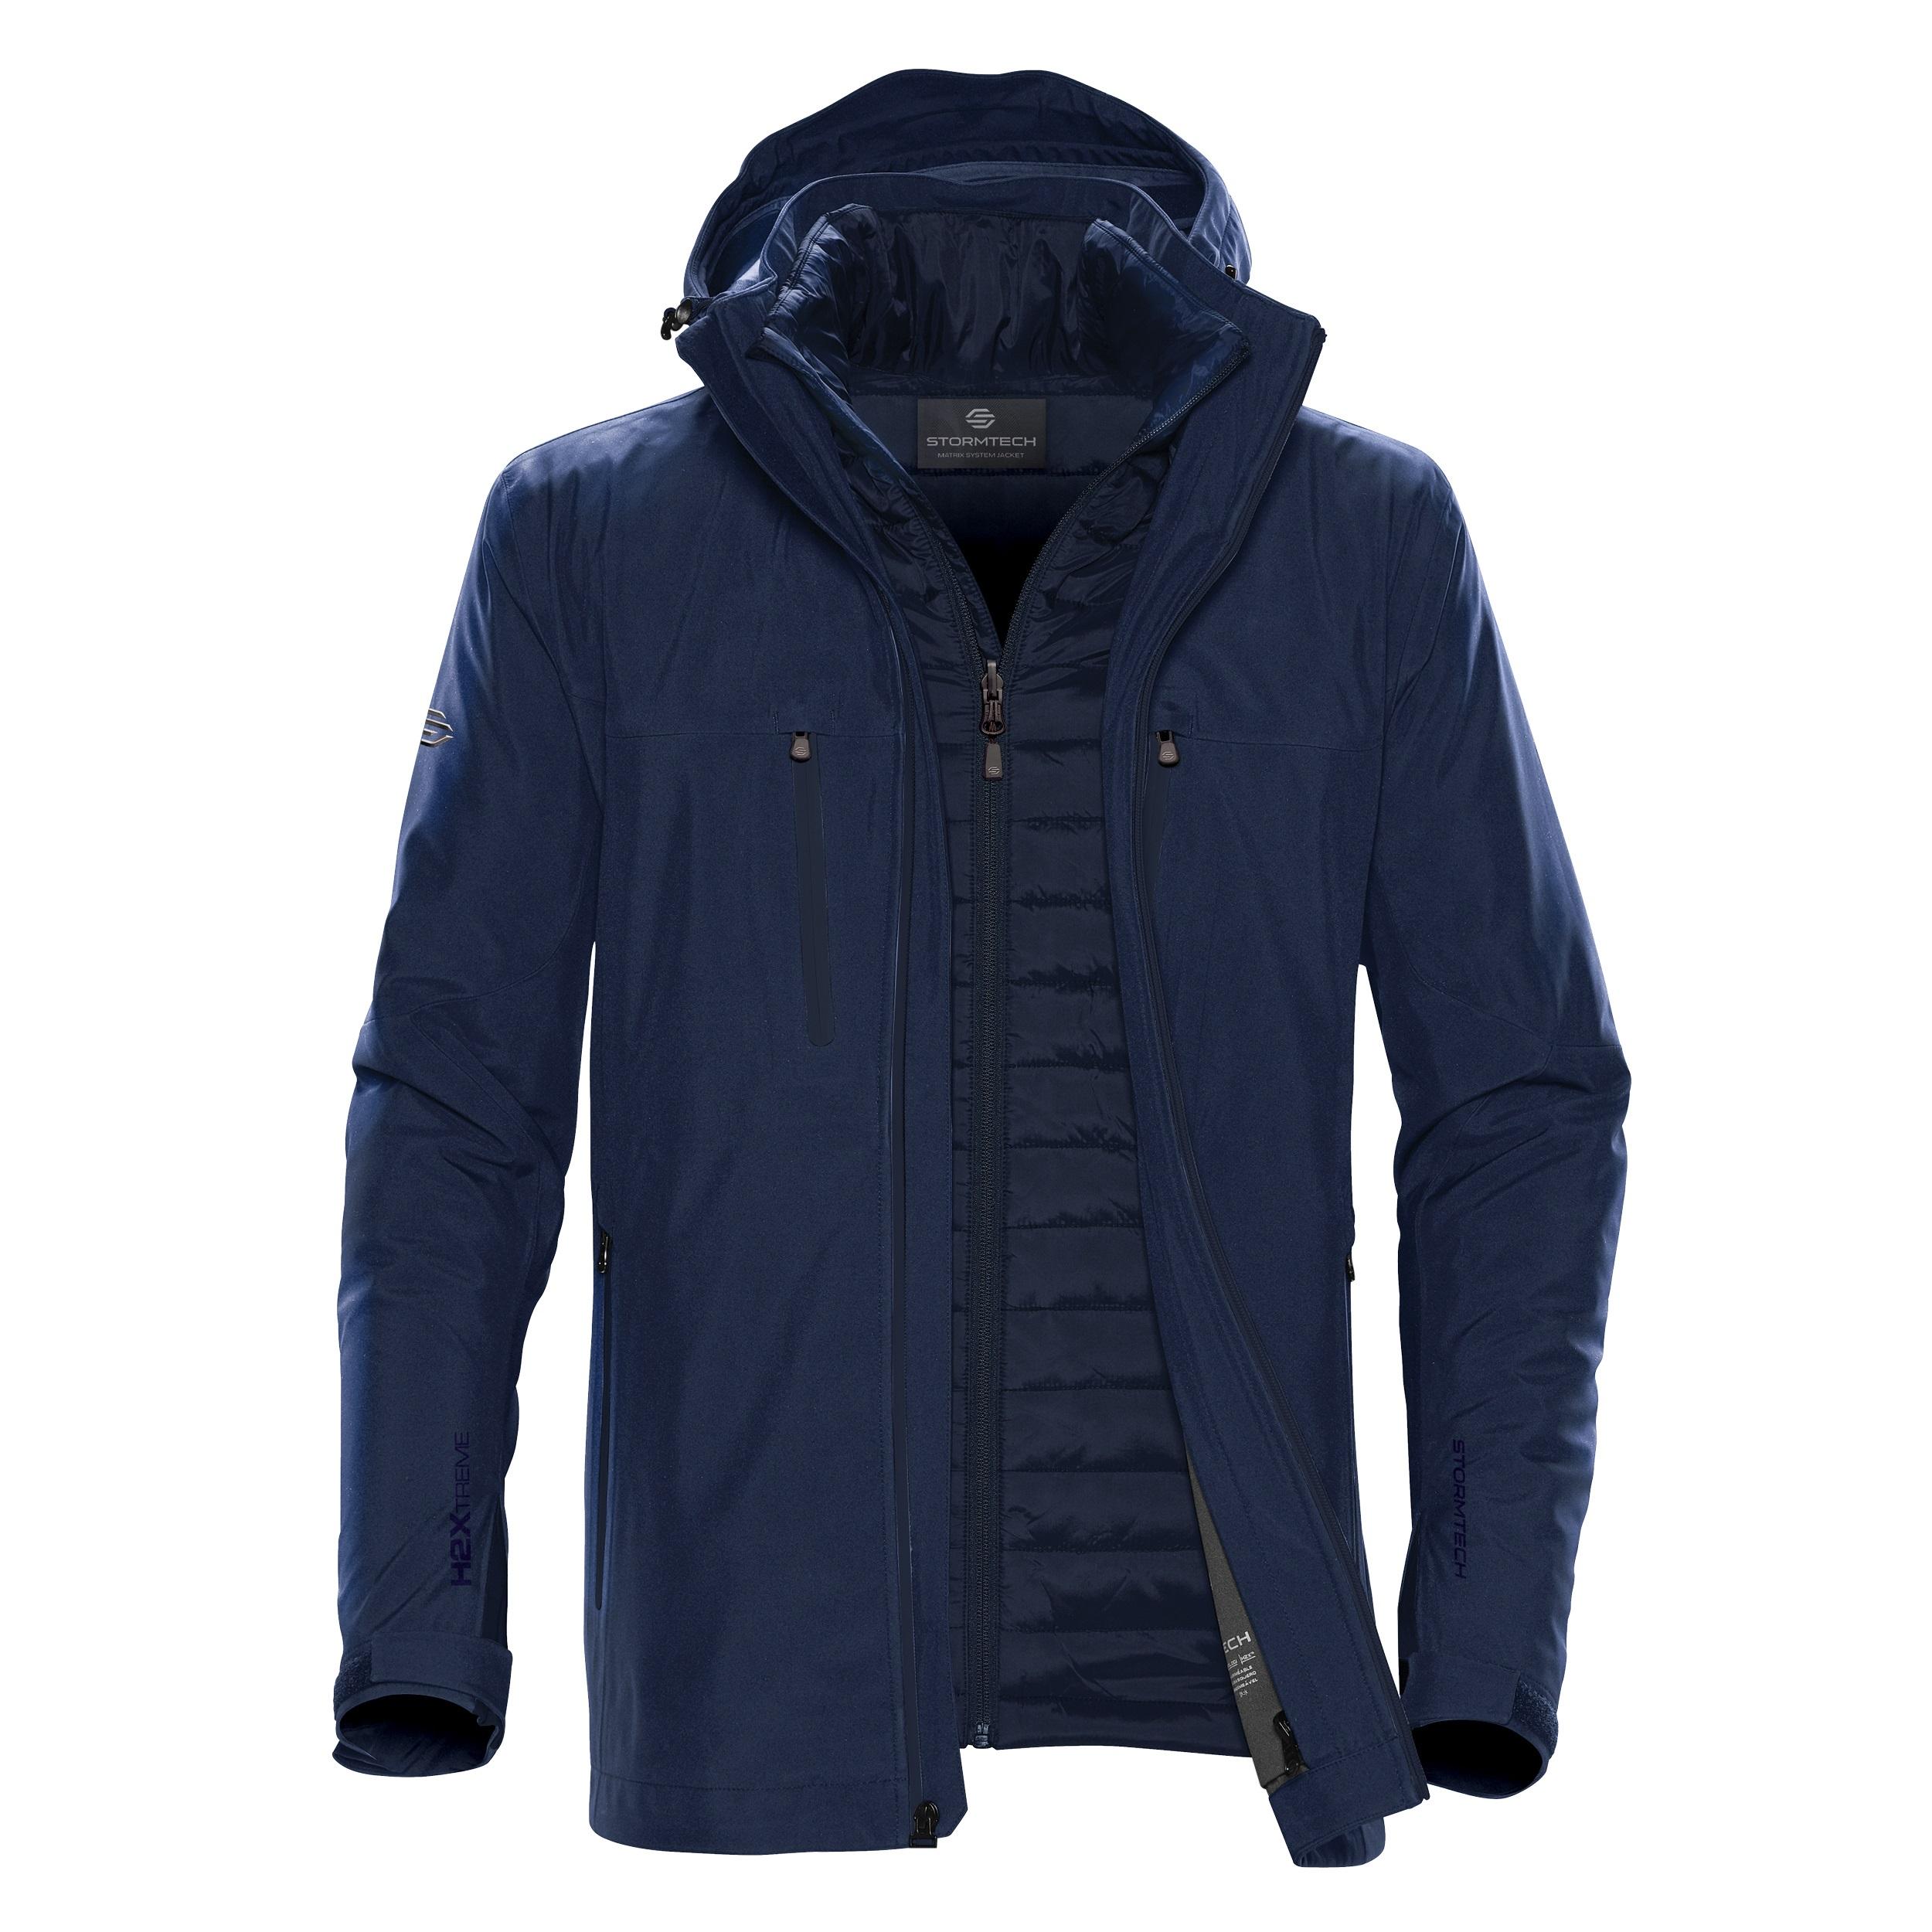 Stormtech Mens Matrix System Jacket (M) (Navy/Navy)